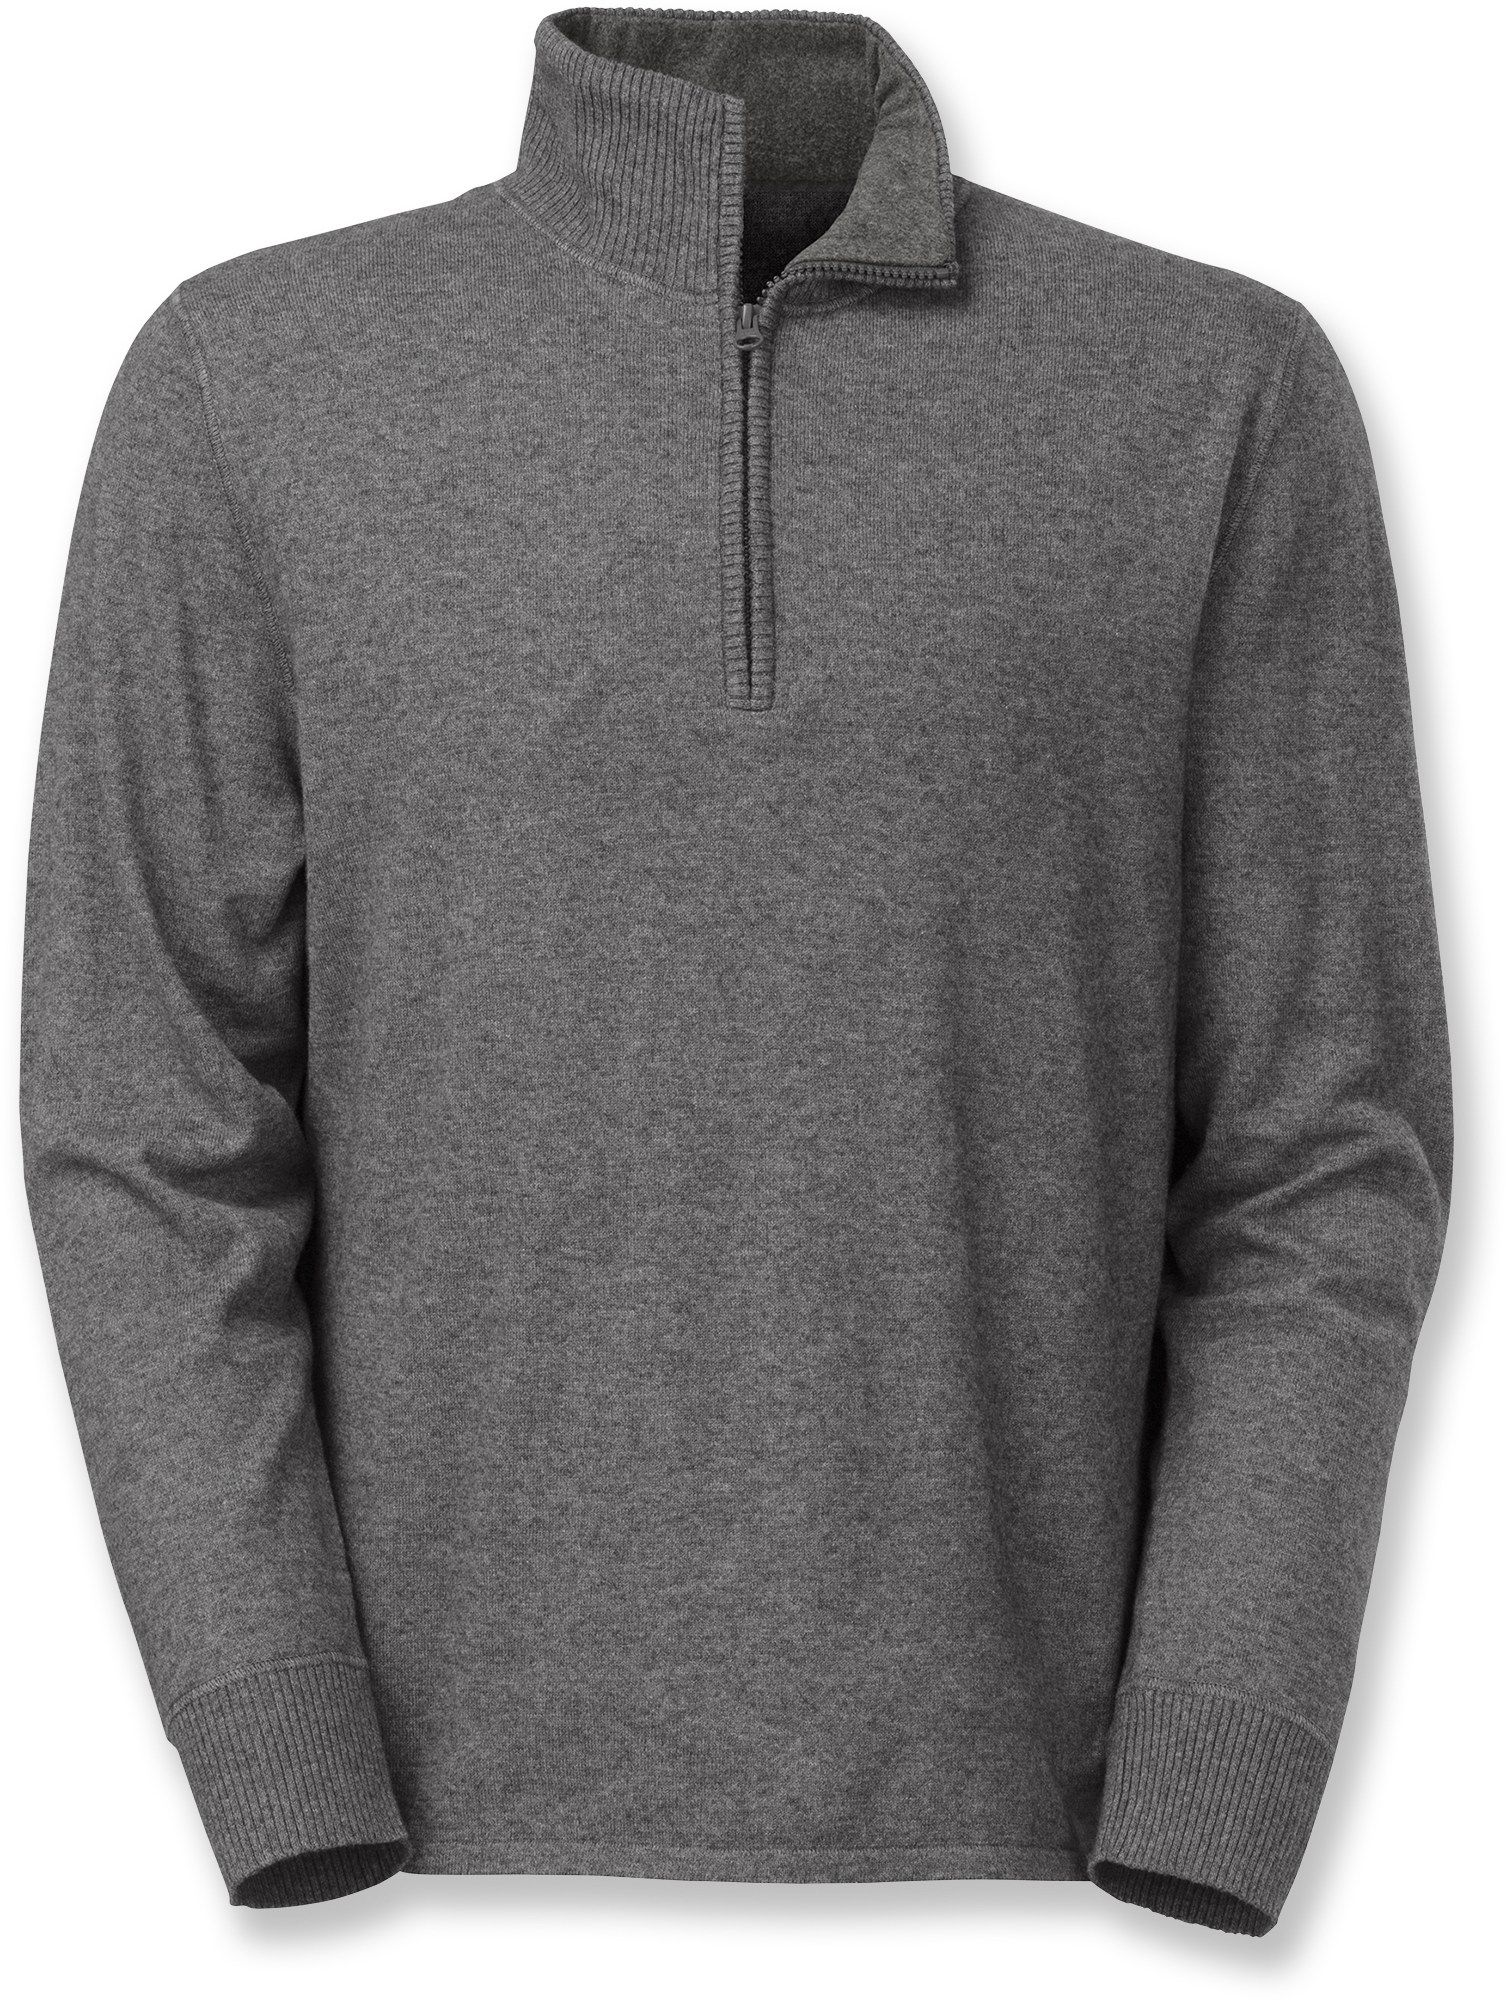 5c25d11b486 The North Face Male Mt. Tam Quarter-Zip Sweater - Men's | *Apparel ...